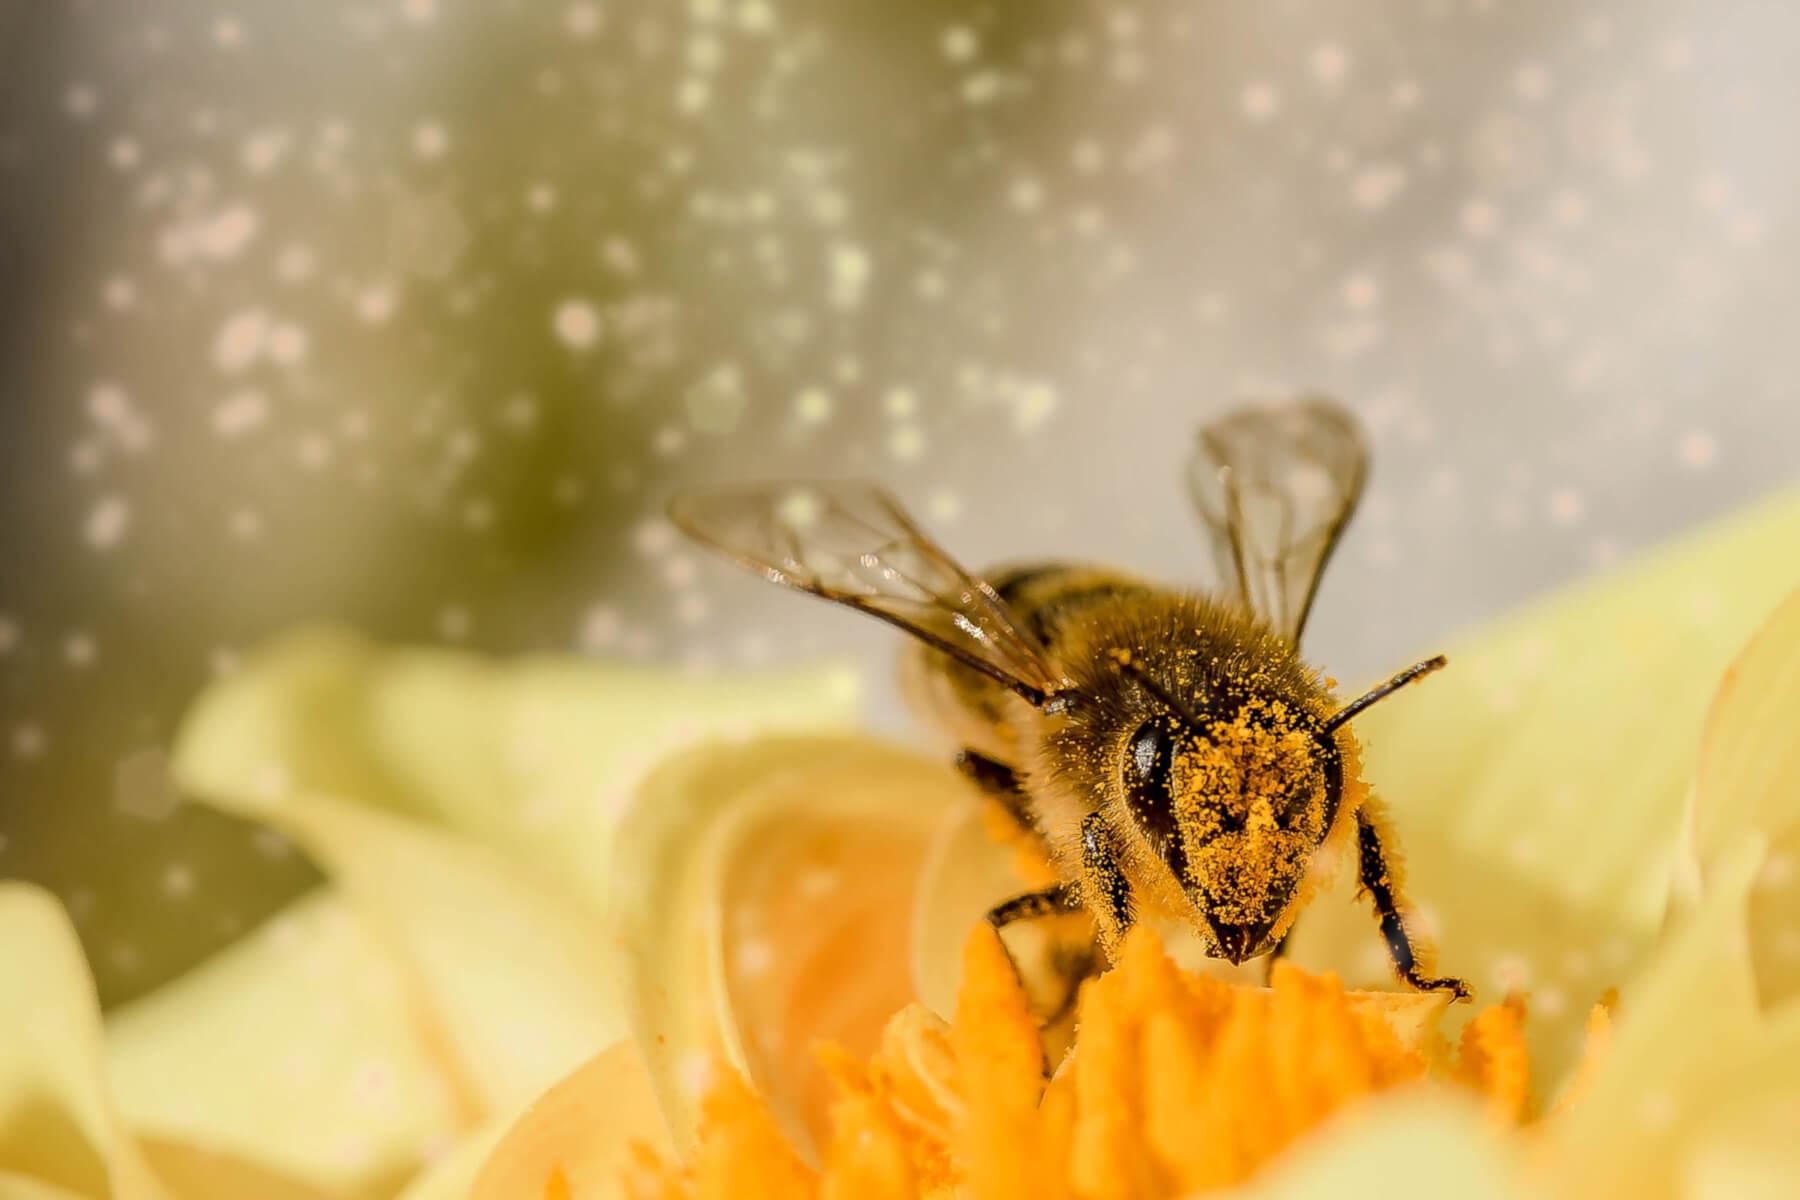 med, pčele, bolesti